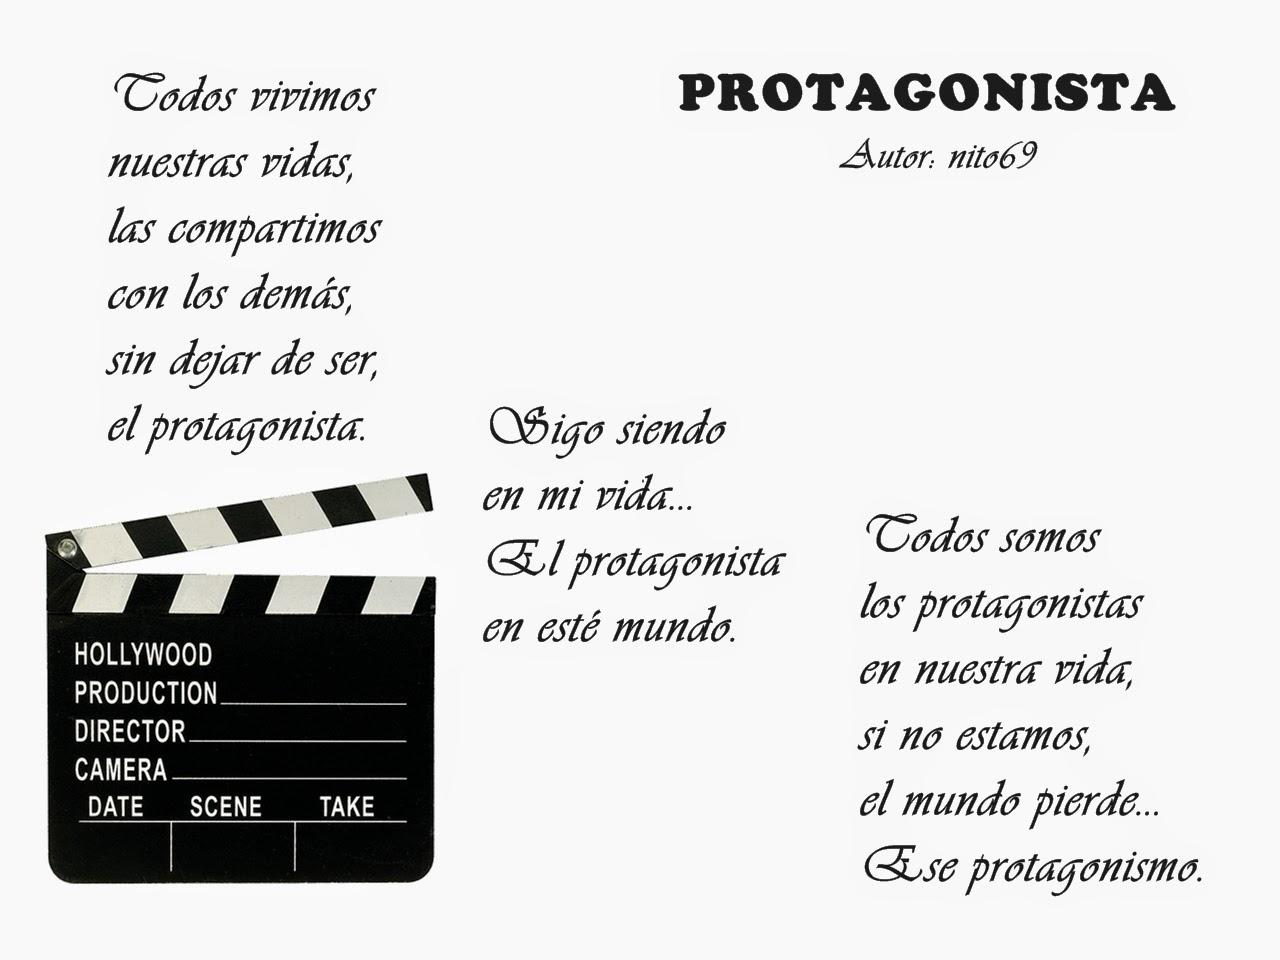 PROTAGONISTA